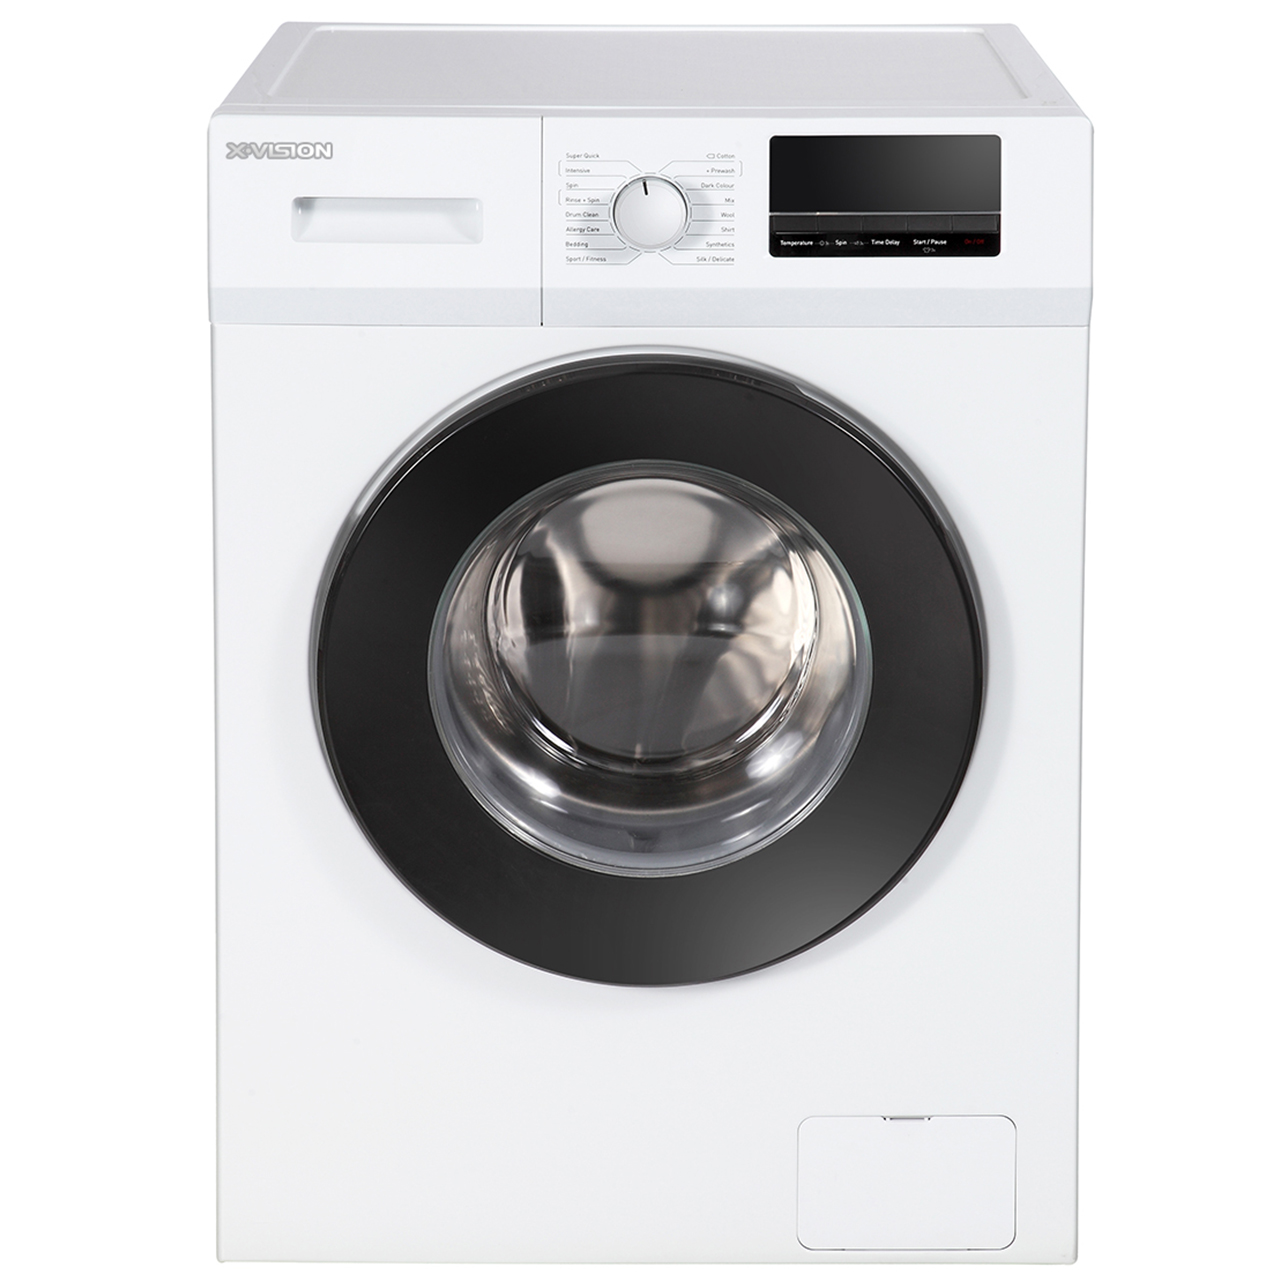 ماشین لباسشویی ایکس ویژن مدل XTW-720B ظرفیت 7 کیلوگرم